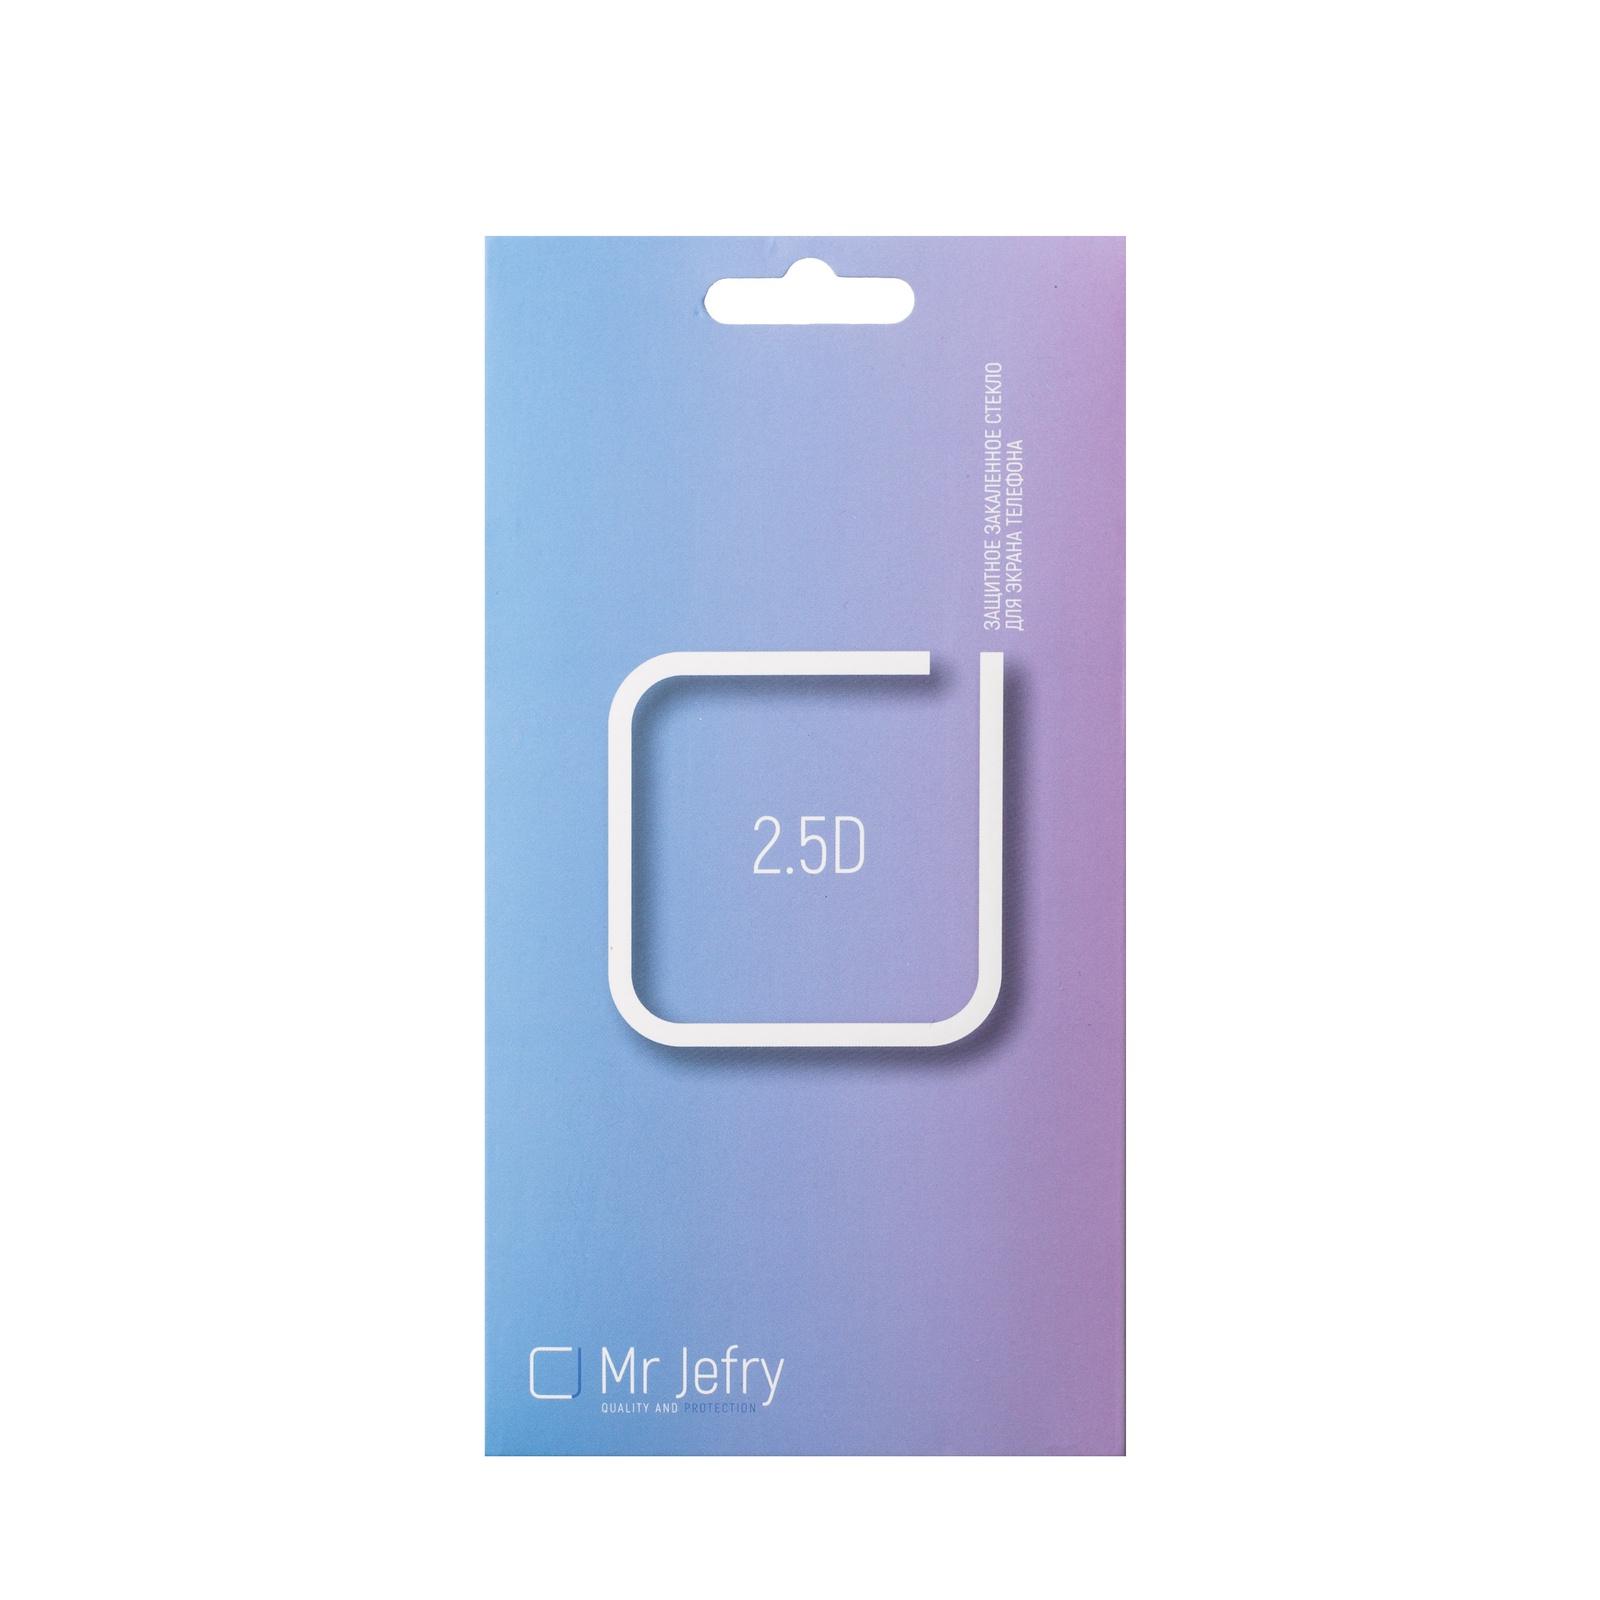 Mr Jefry стекло защитное (многослойное) 2,5D для Huawei Honor 9 lite